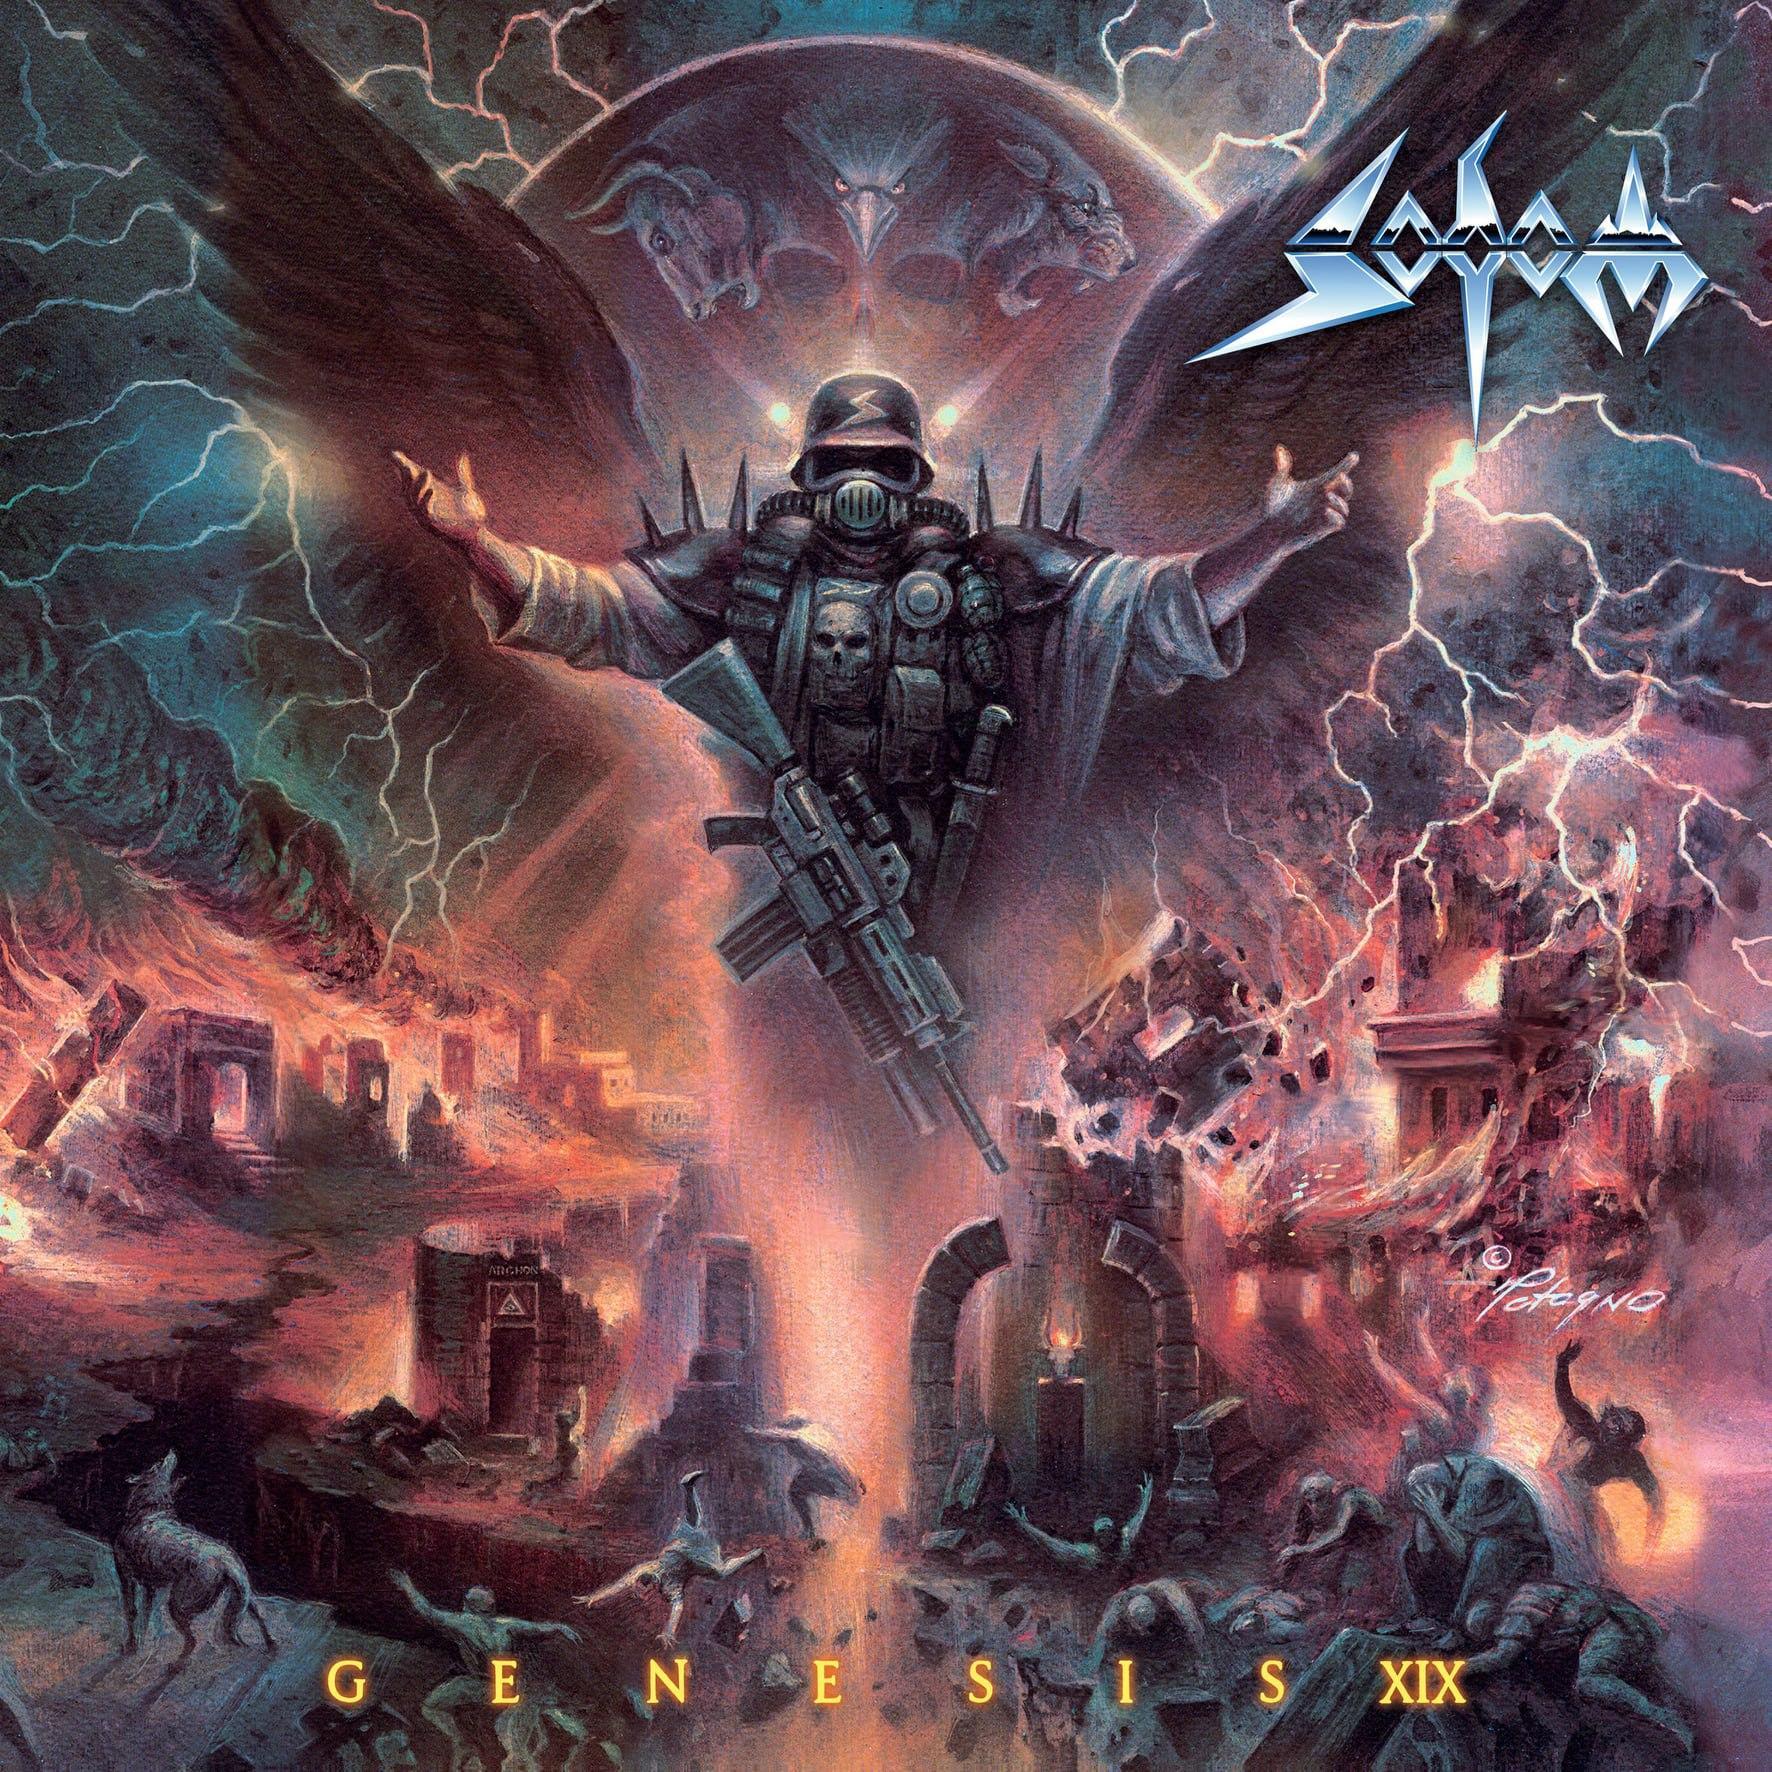 Genesis xix sodom